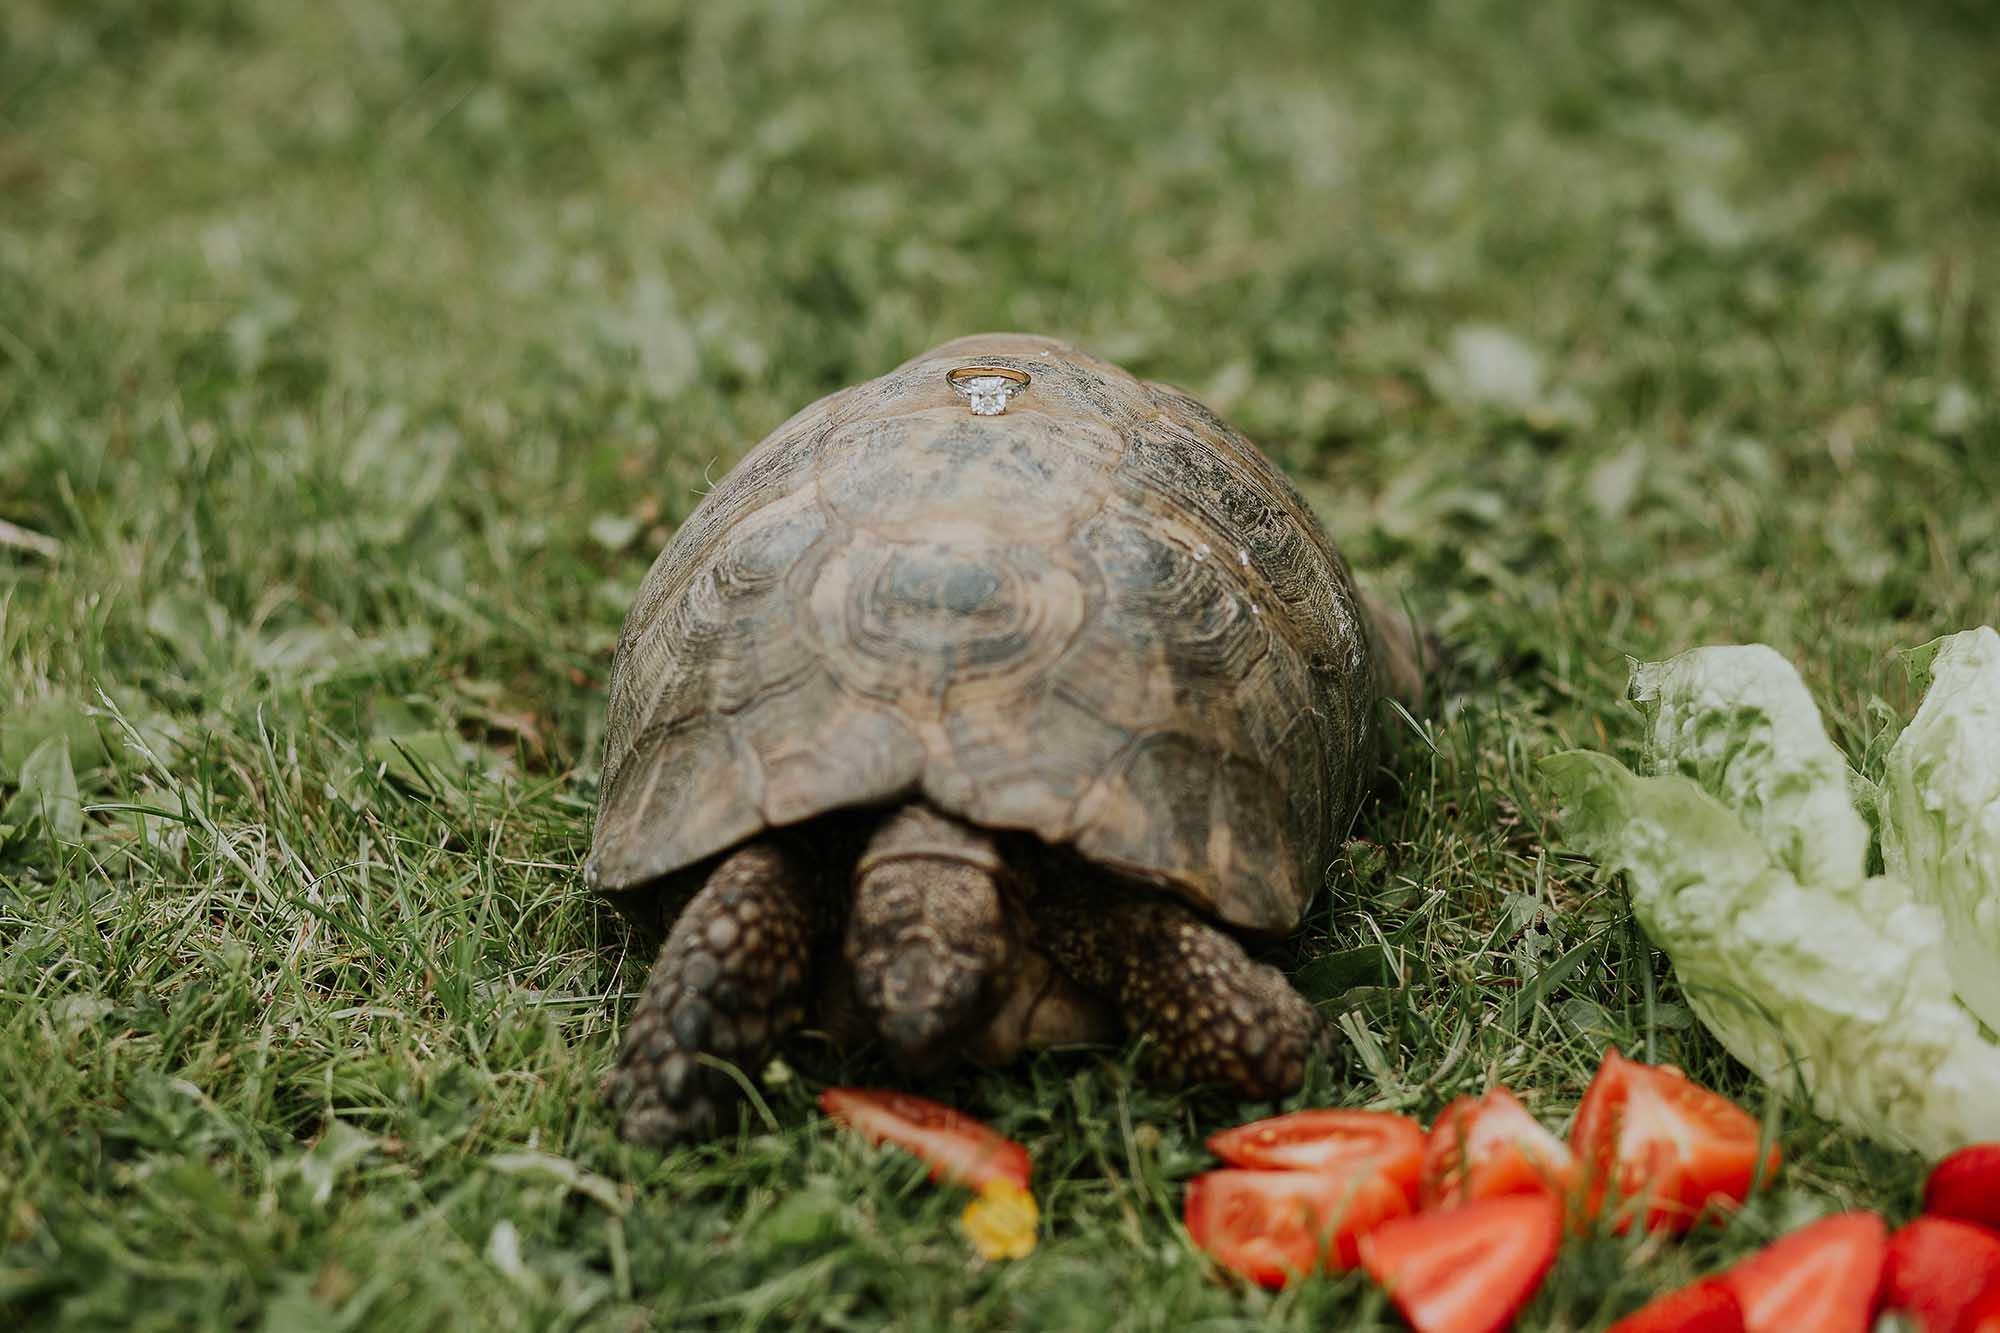 Wedding ring on pet tortoise